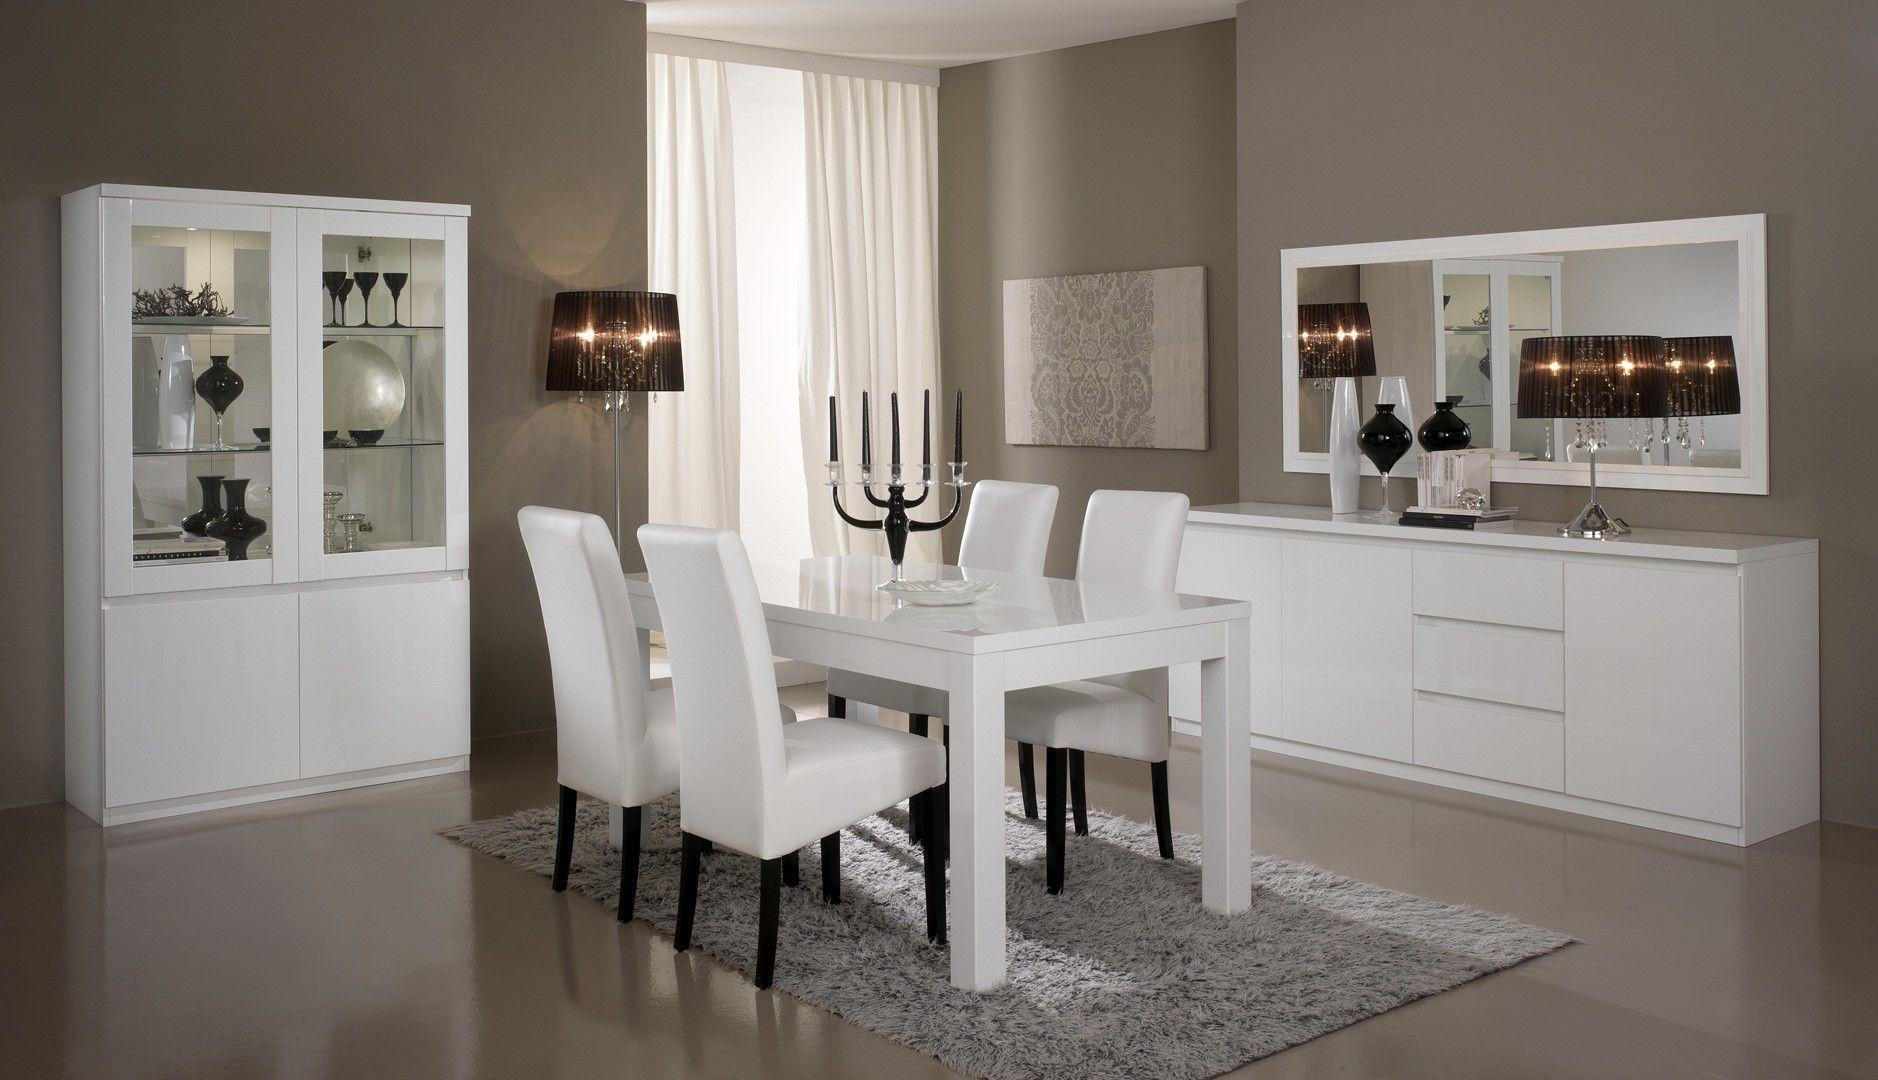 1000 ideas about salle manger complte on pinterest grande table a manger art de salle manger and but salle a manger